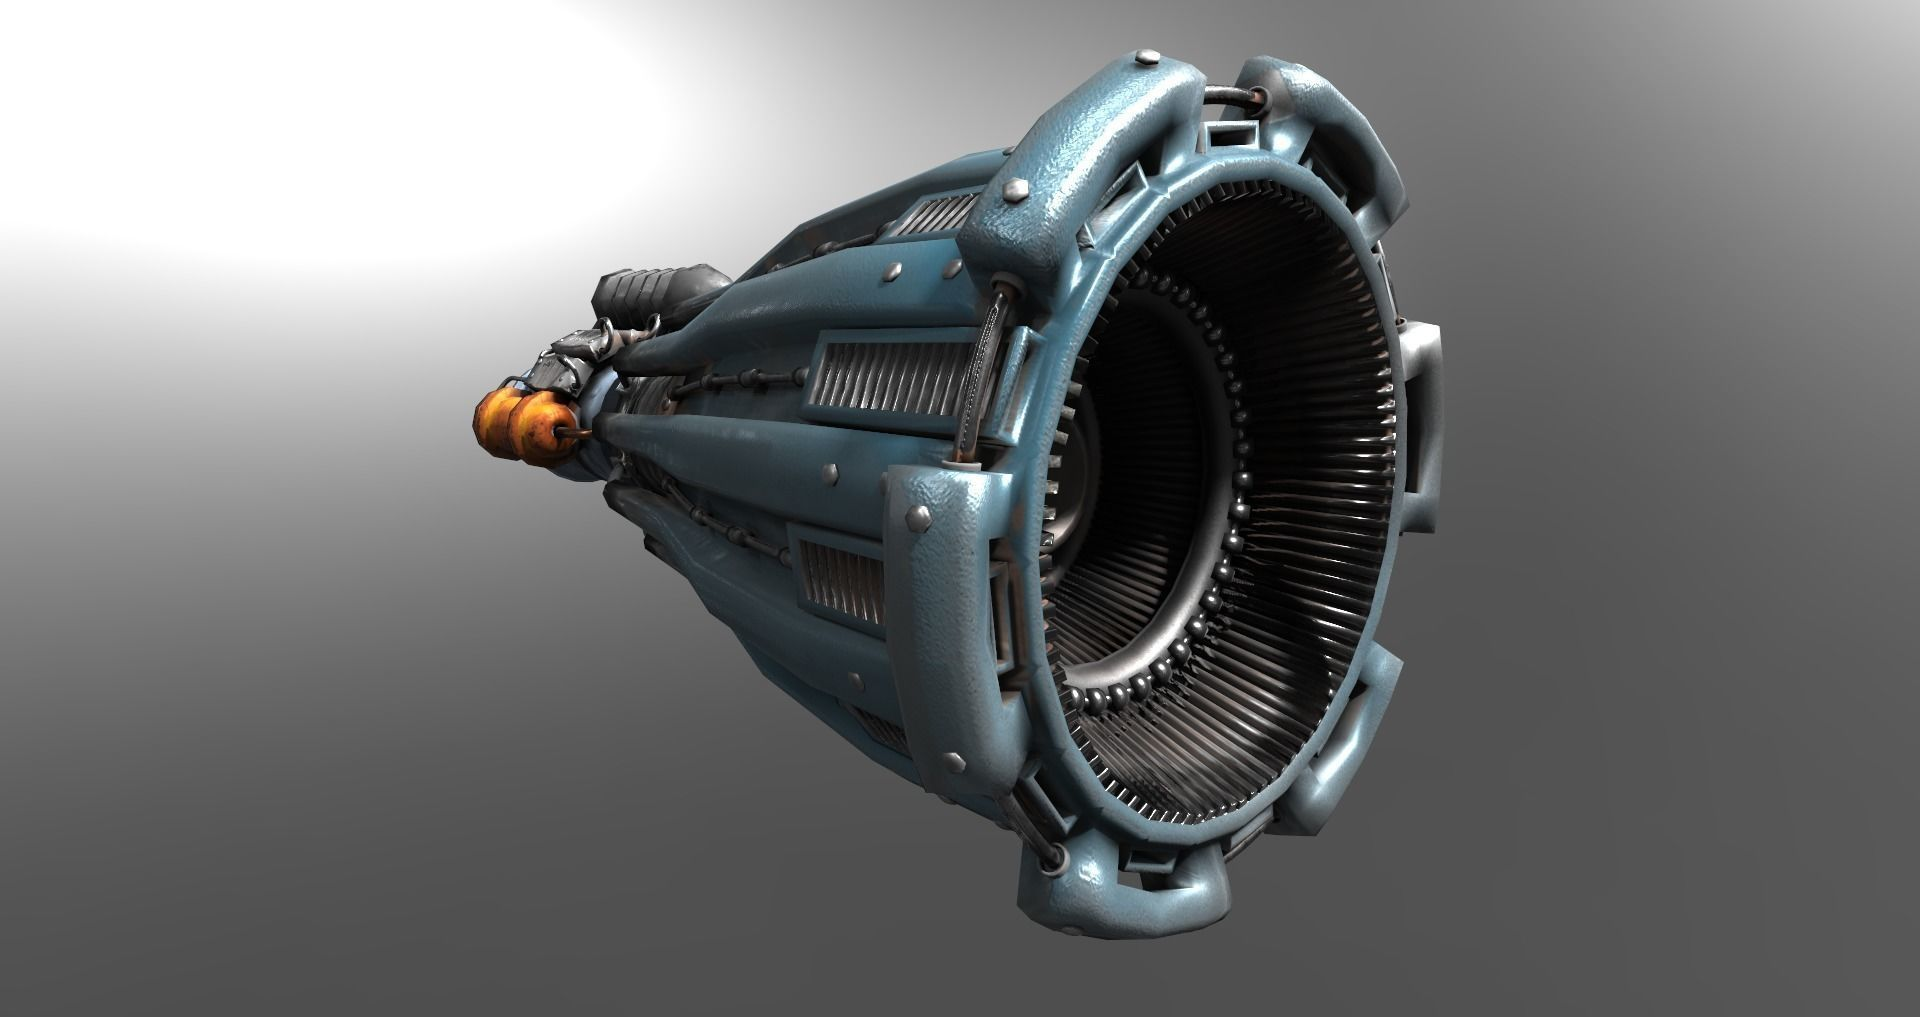 STL Scifi Rocket Engine Shroud